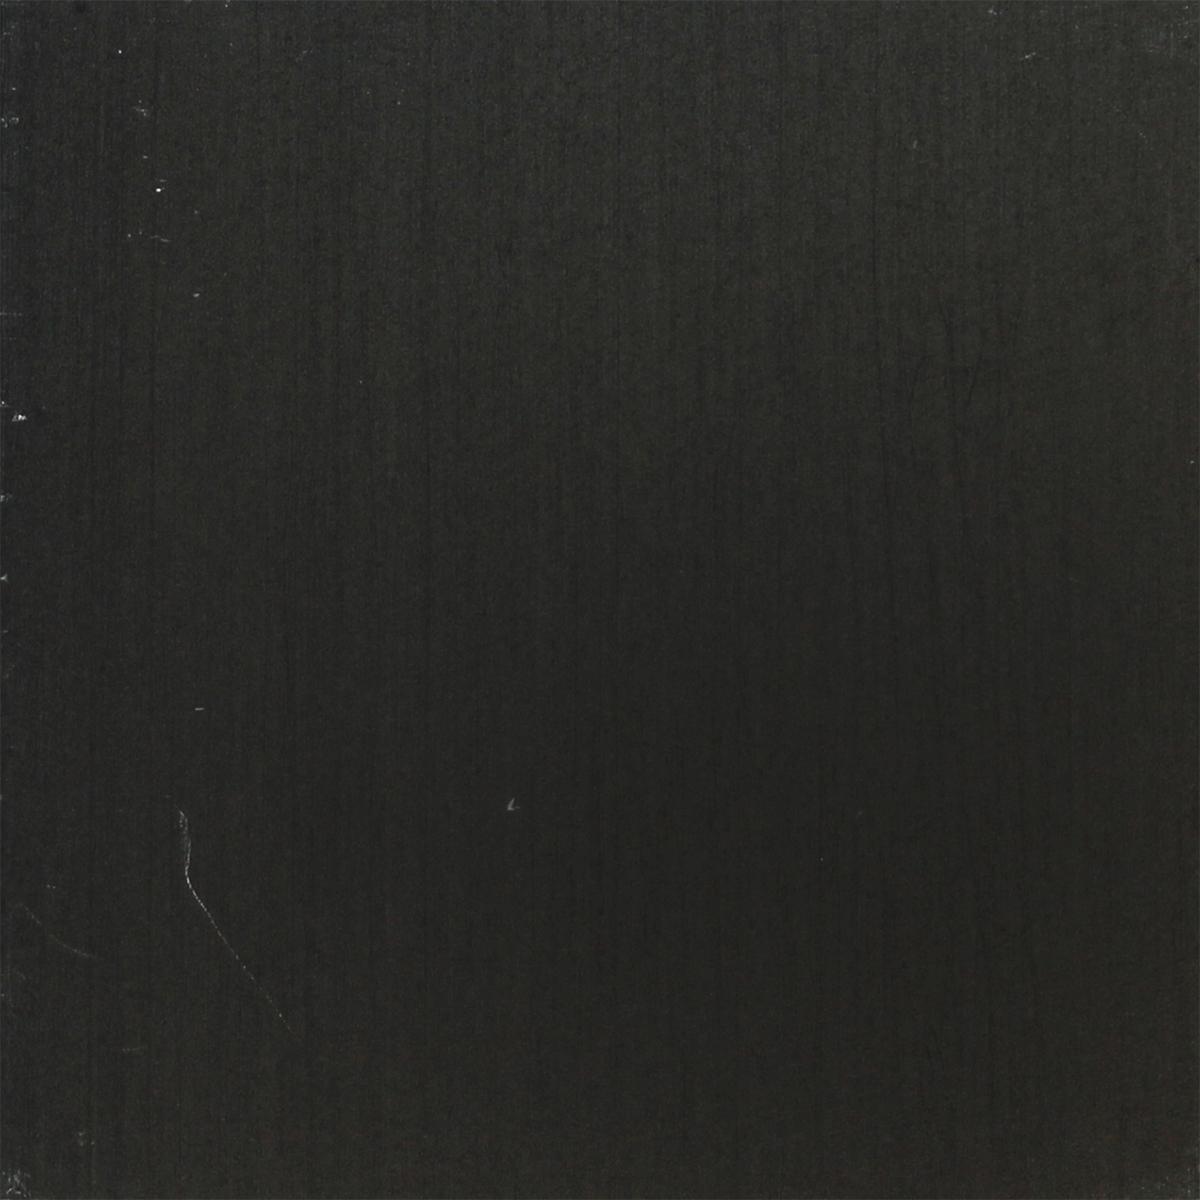 Elox bronzo scuro 8